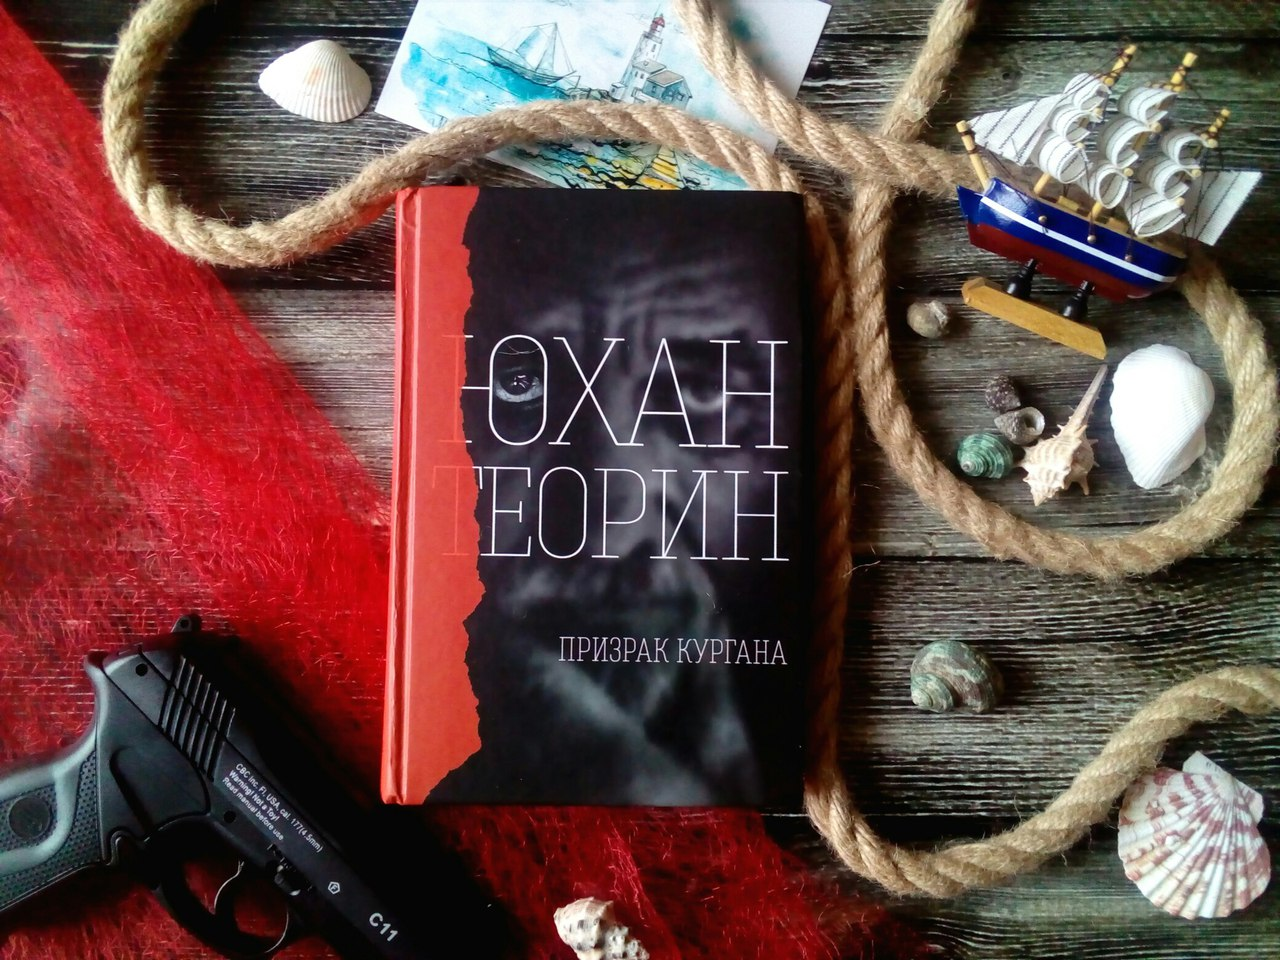 ЮХАН ТЕОРИН ПРИЗРАК КУРГАНА СКАЧАТЬ БЕСПЛАТНО